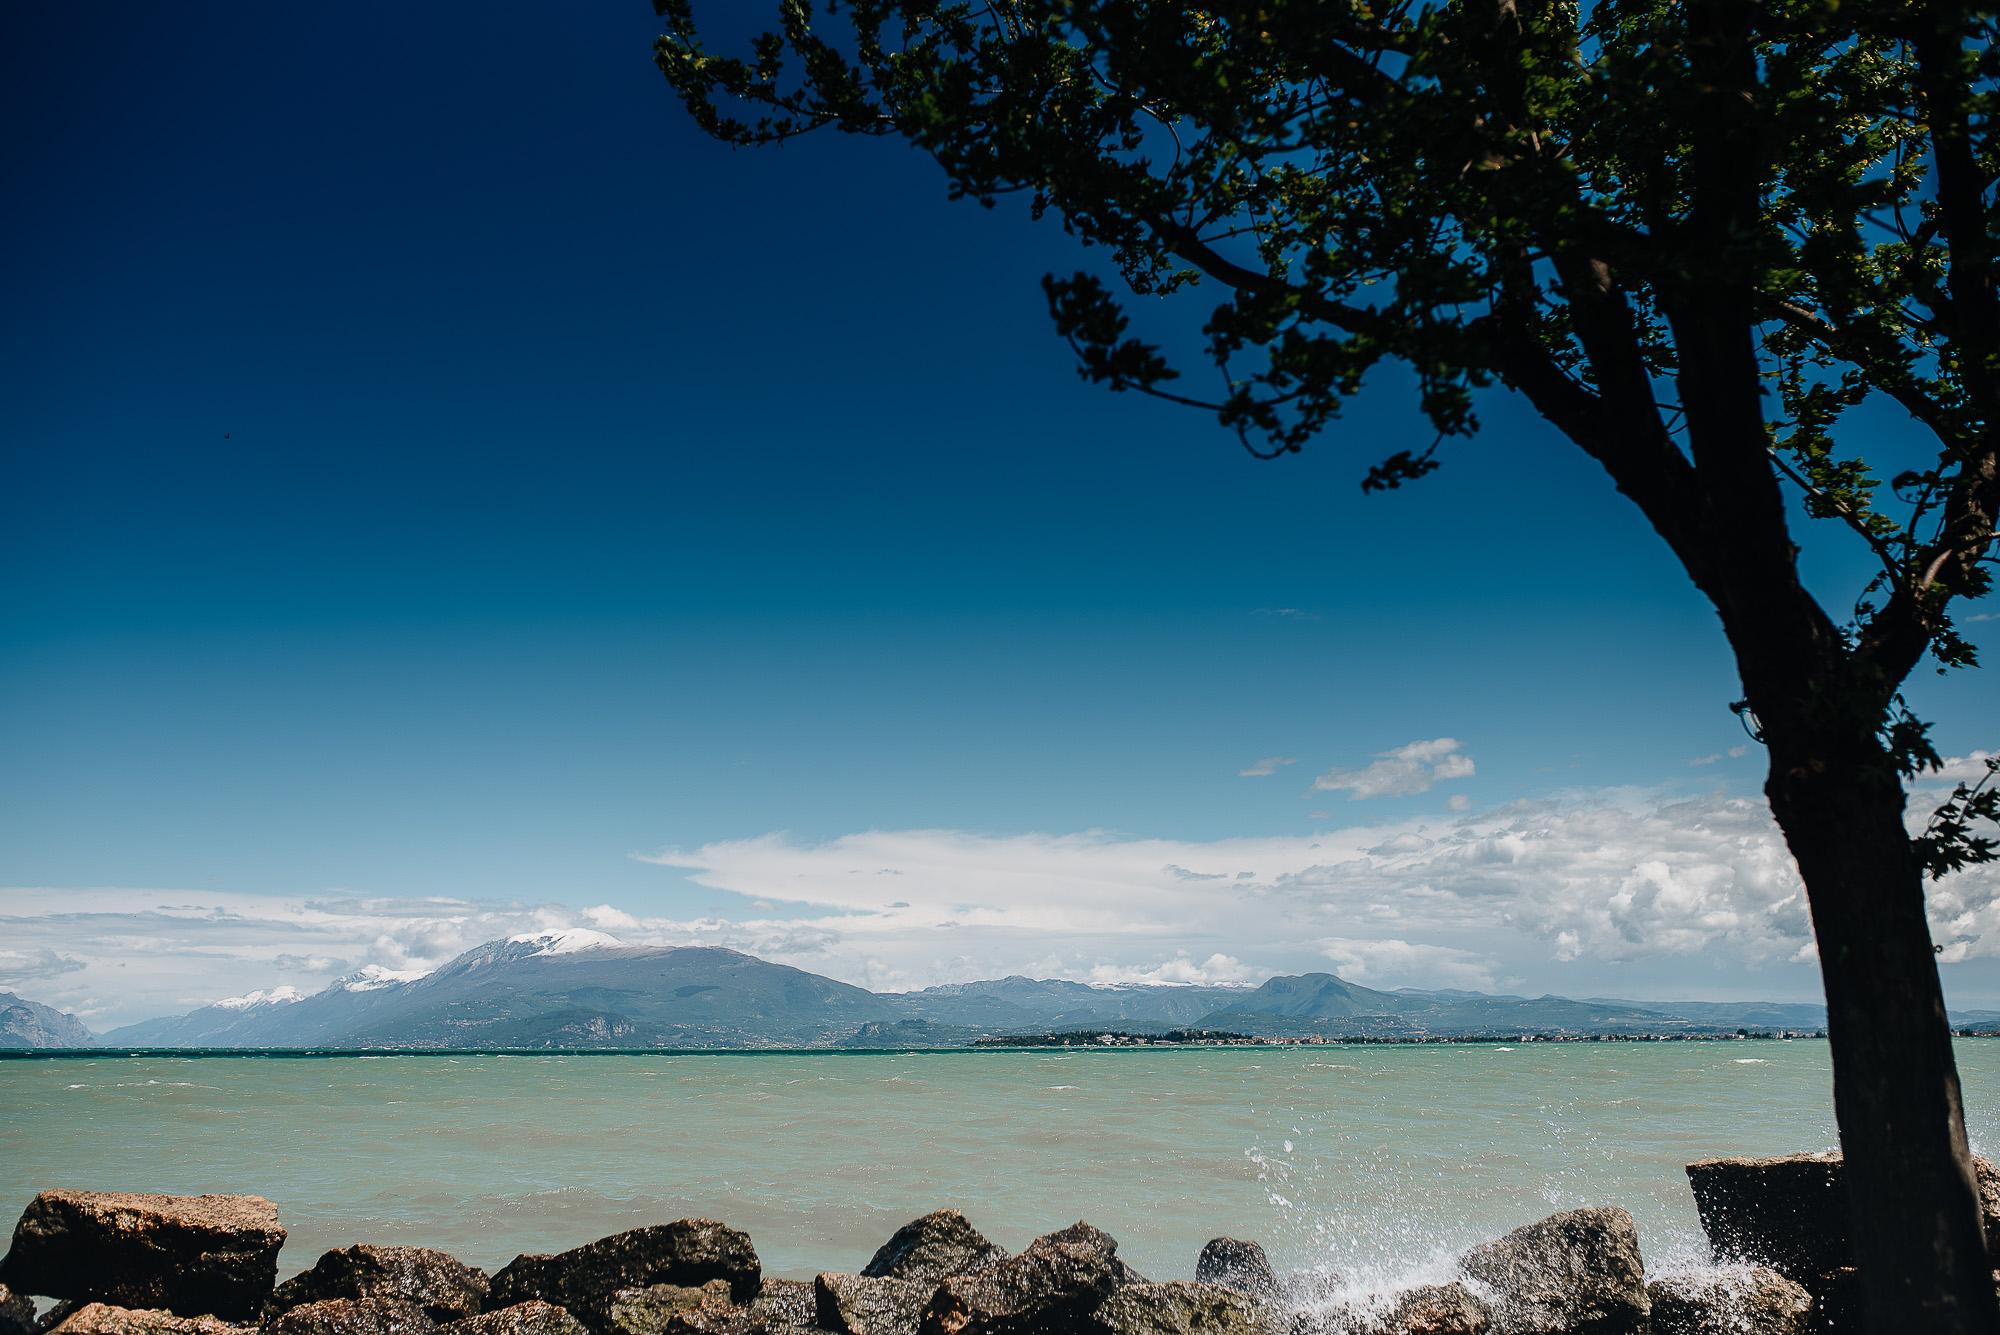 OurBeautifulAdventure-LakeGarda-Italy-Blog-1402.jpg